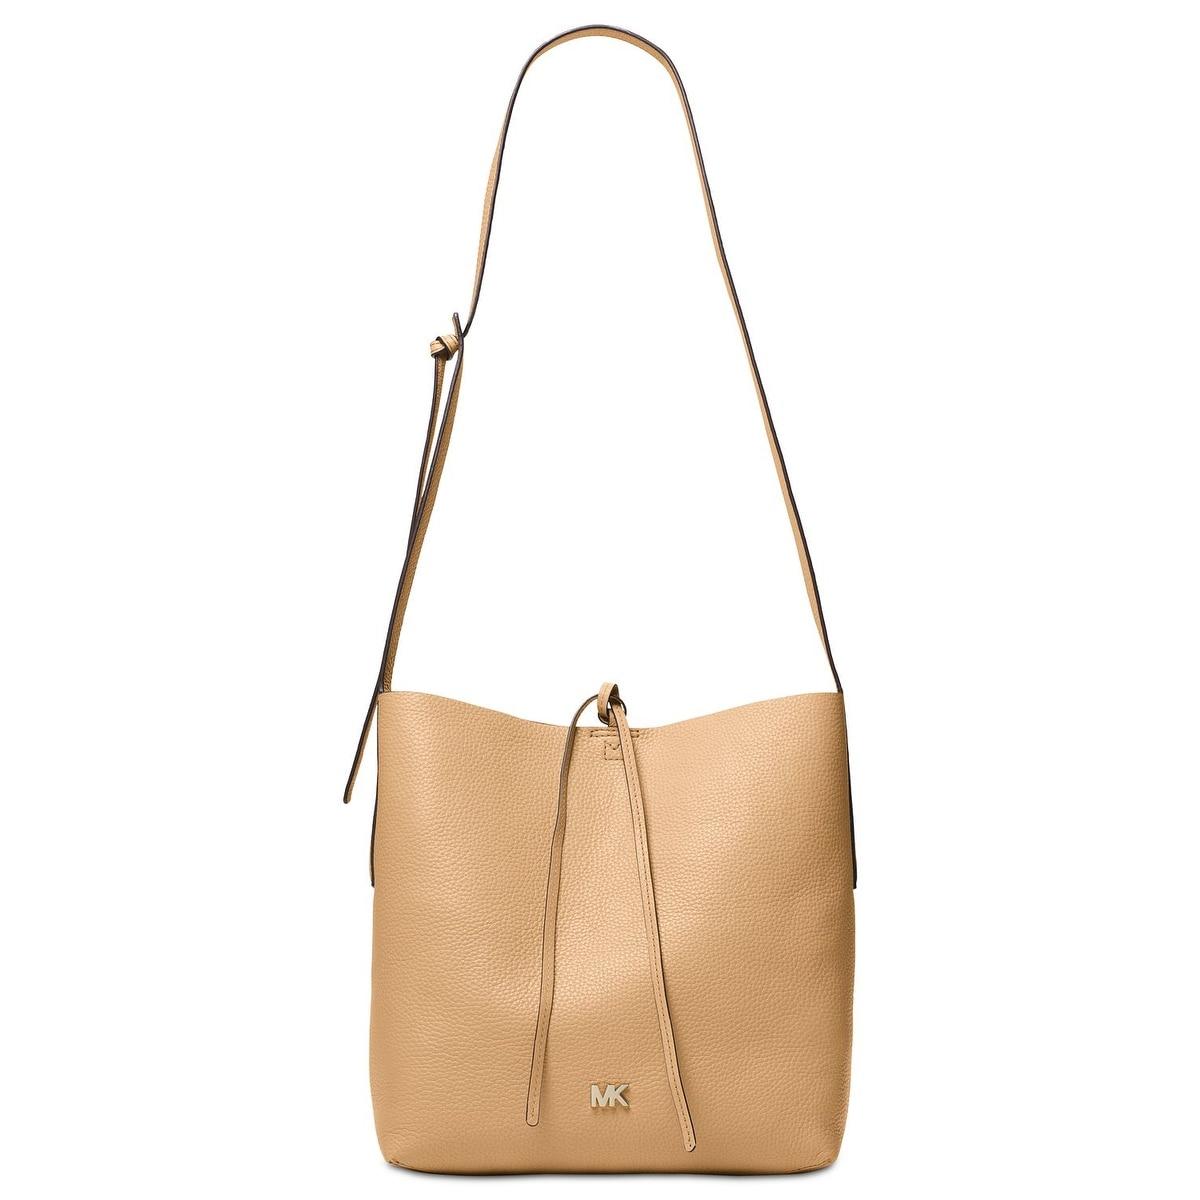 2dea3aa0146b MICHAEL Michael Kors Handbags | Shop our Best Clothing & Shoes Deals Online  at Overstock